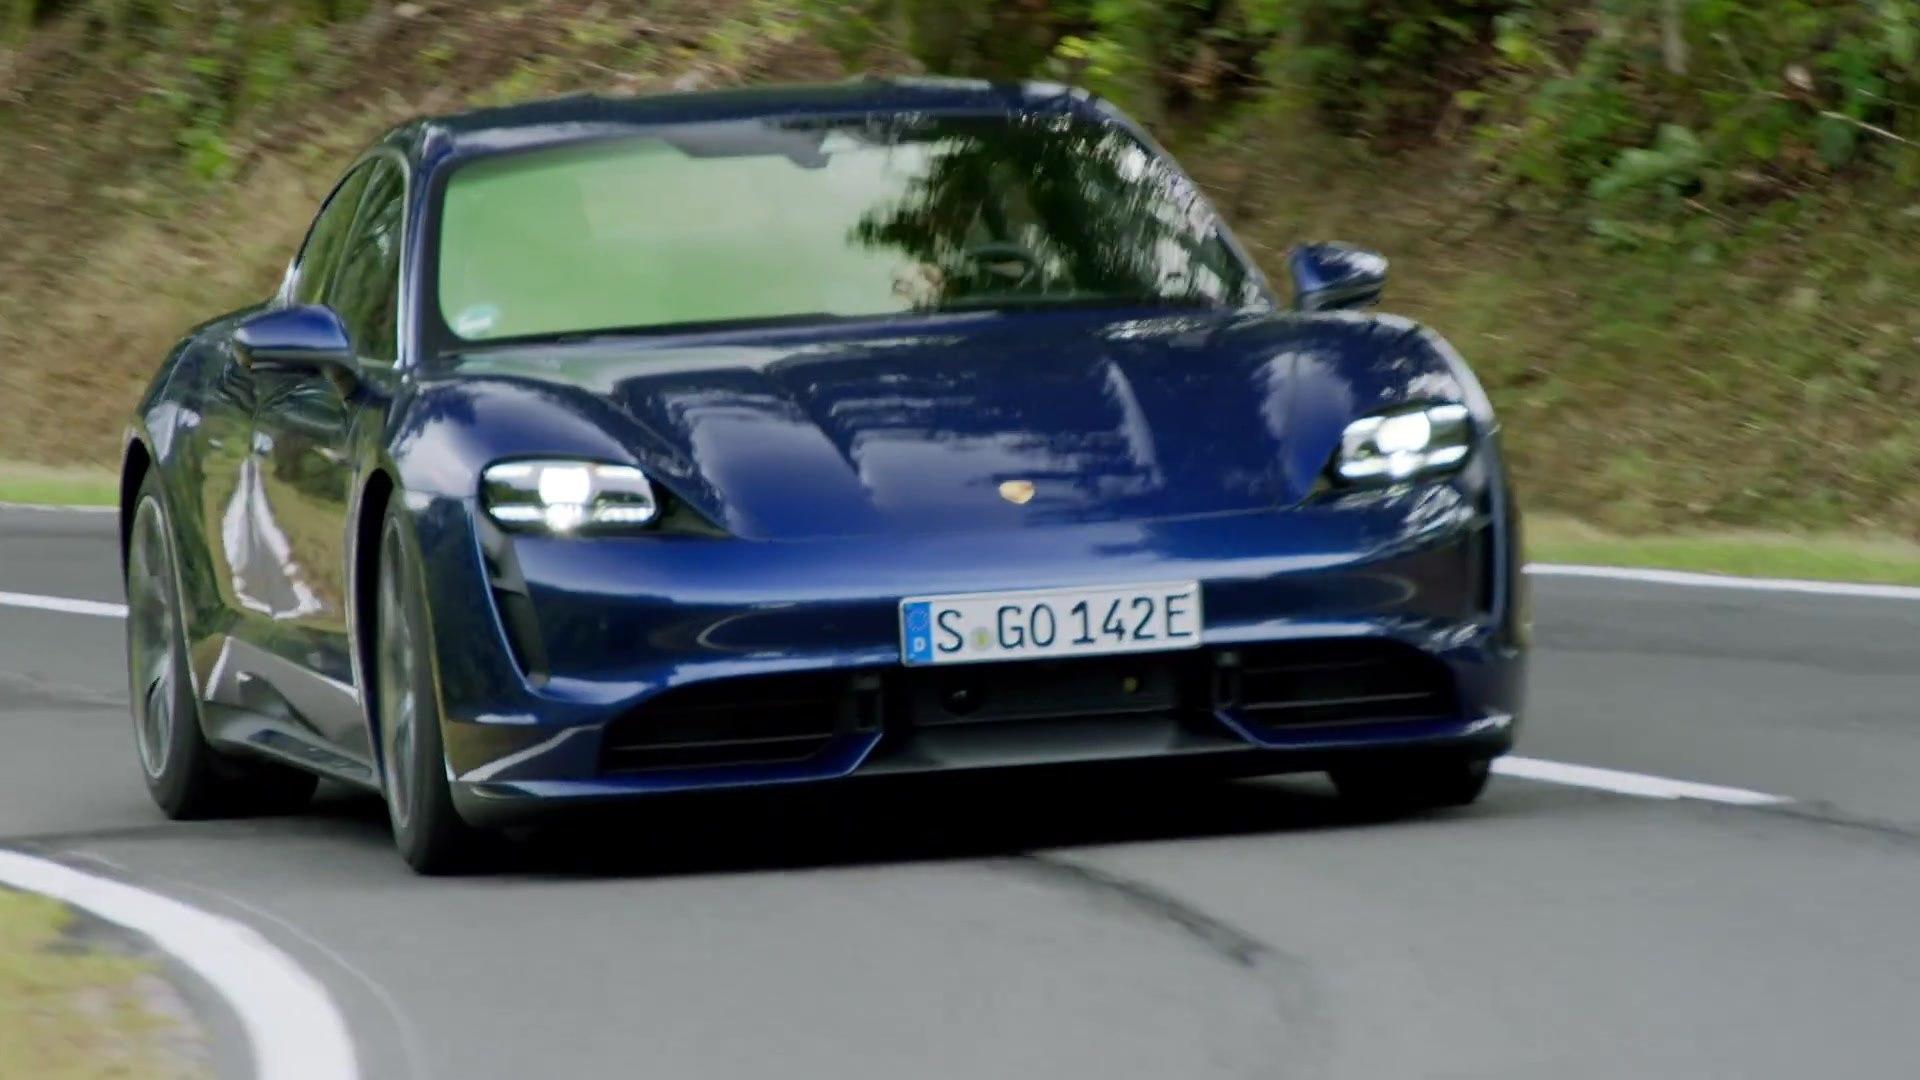 Porsche Taycan Turbo In Gentian Blue Metallic Driving Video Video Dailymotion